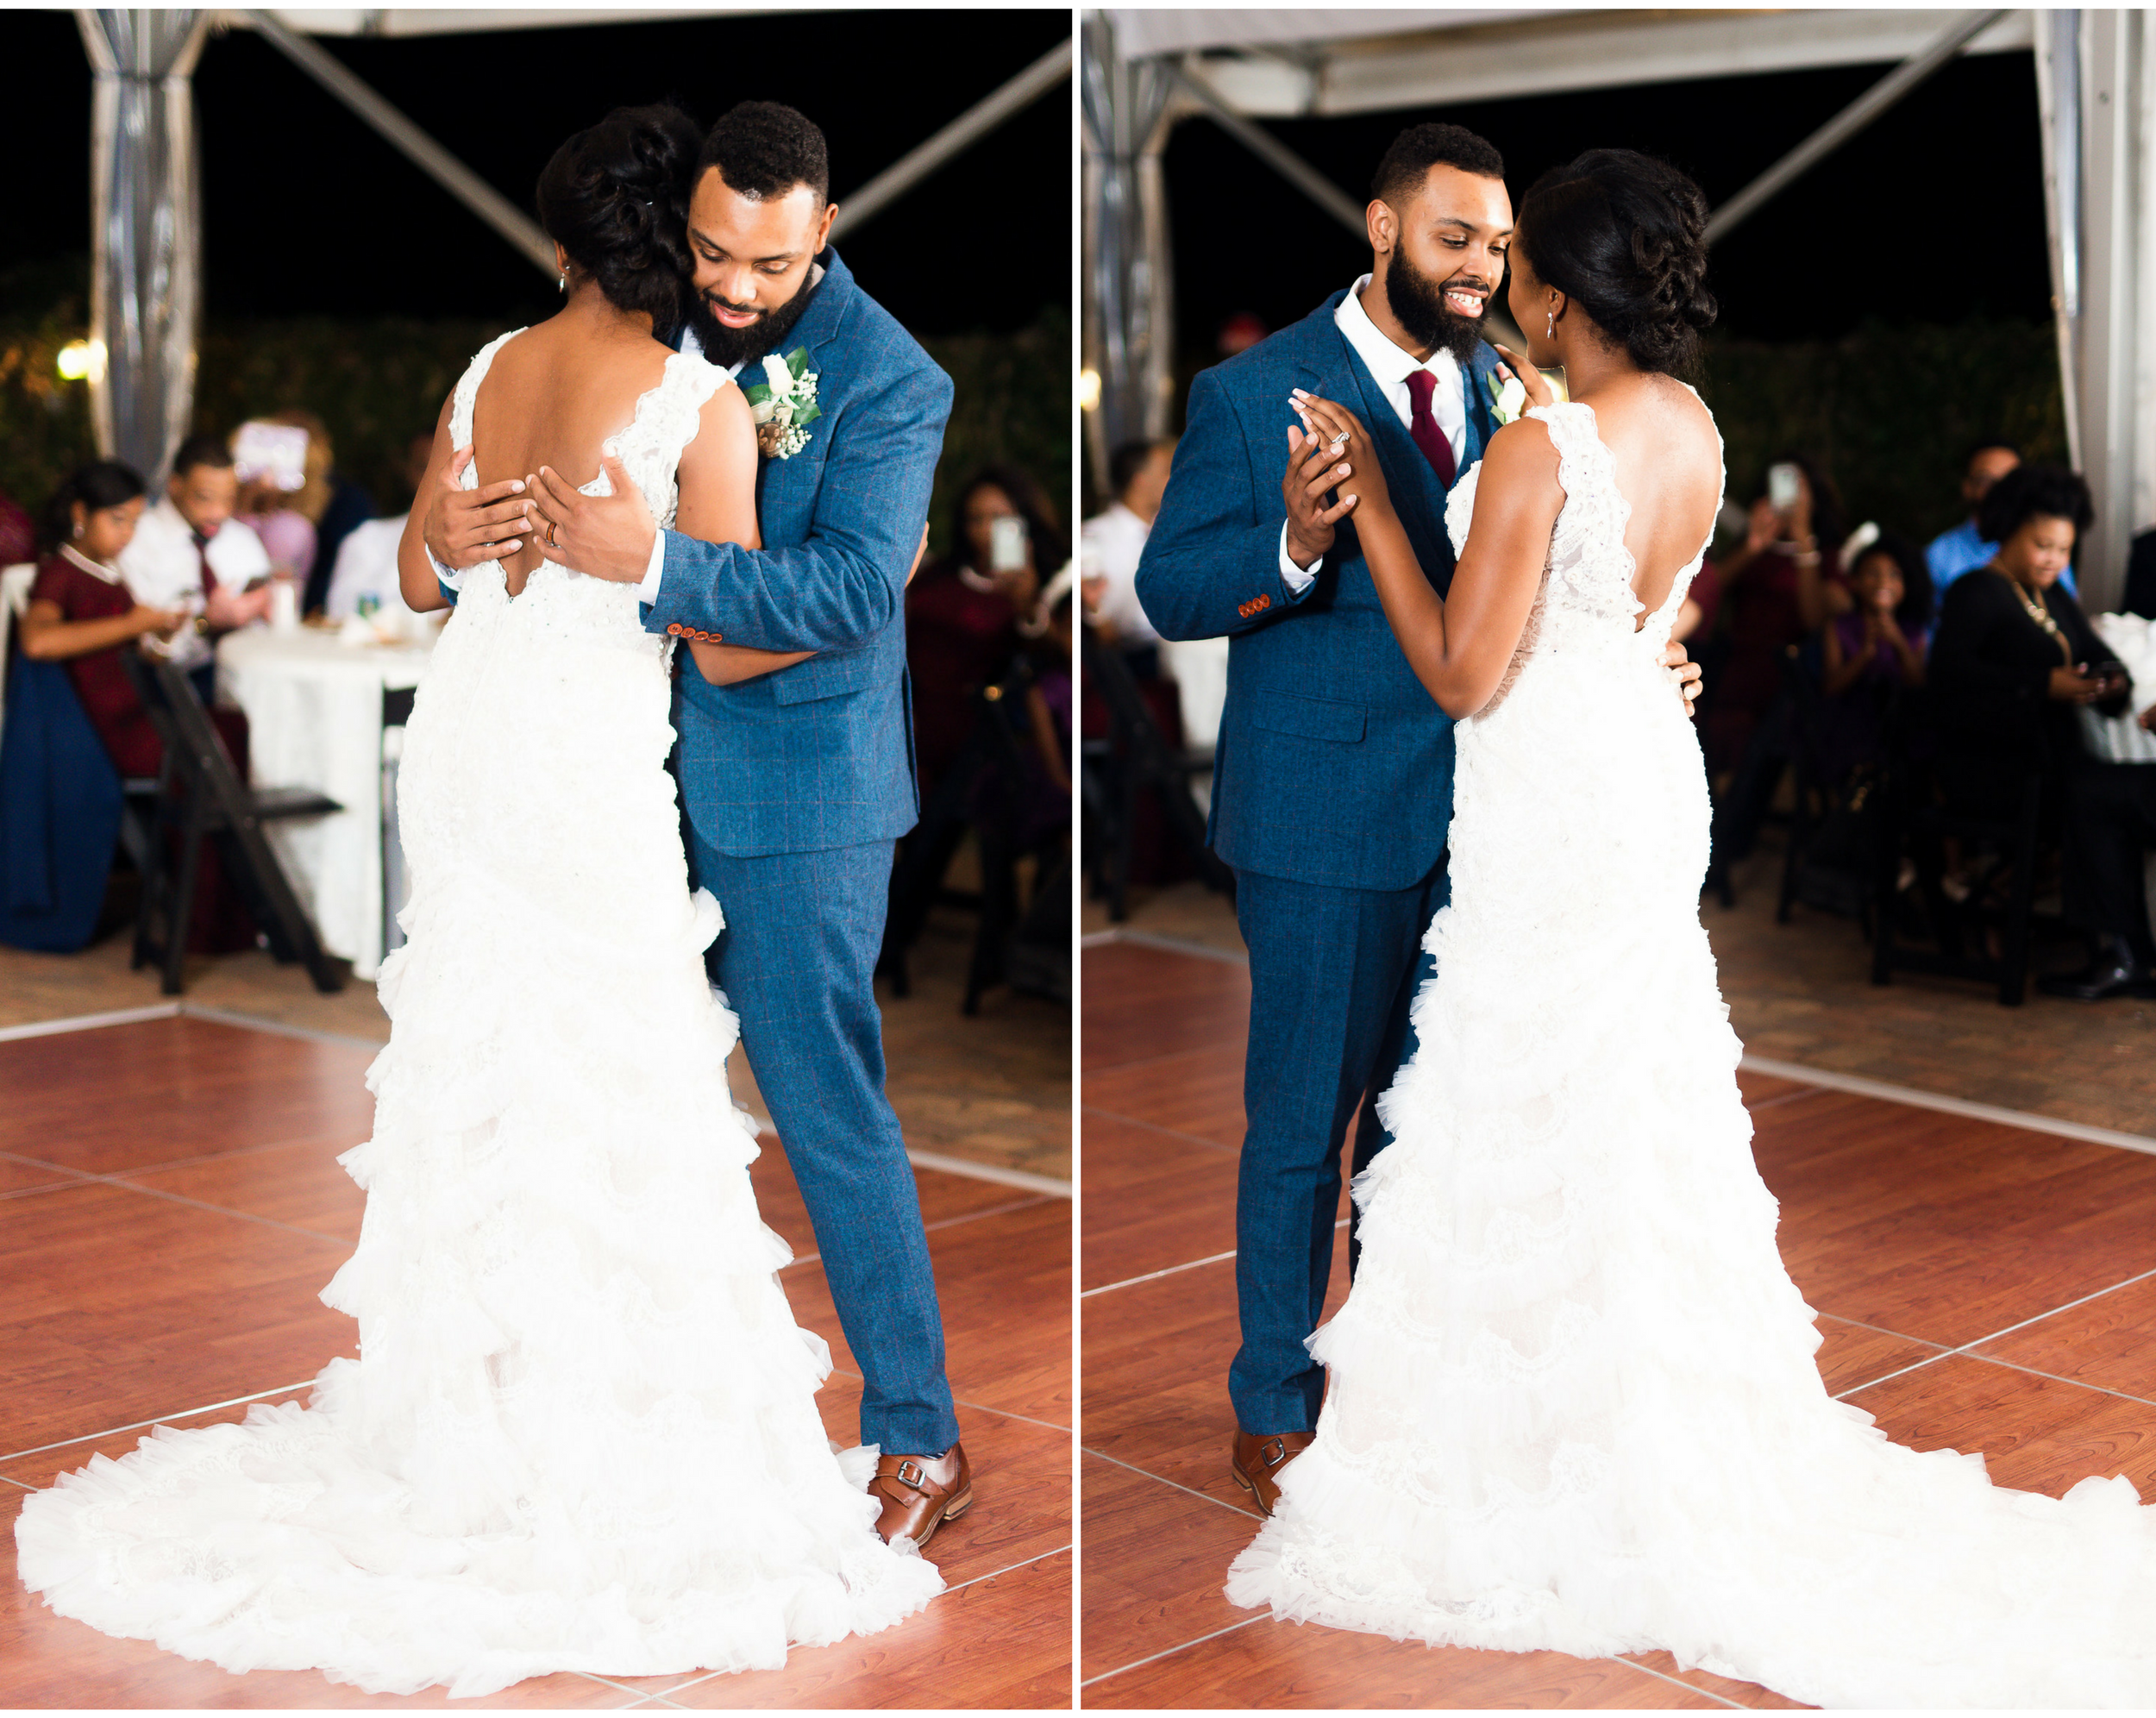 TC-Jessica-Garr-Pharris-Photography-Real-Wedding-9.png